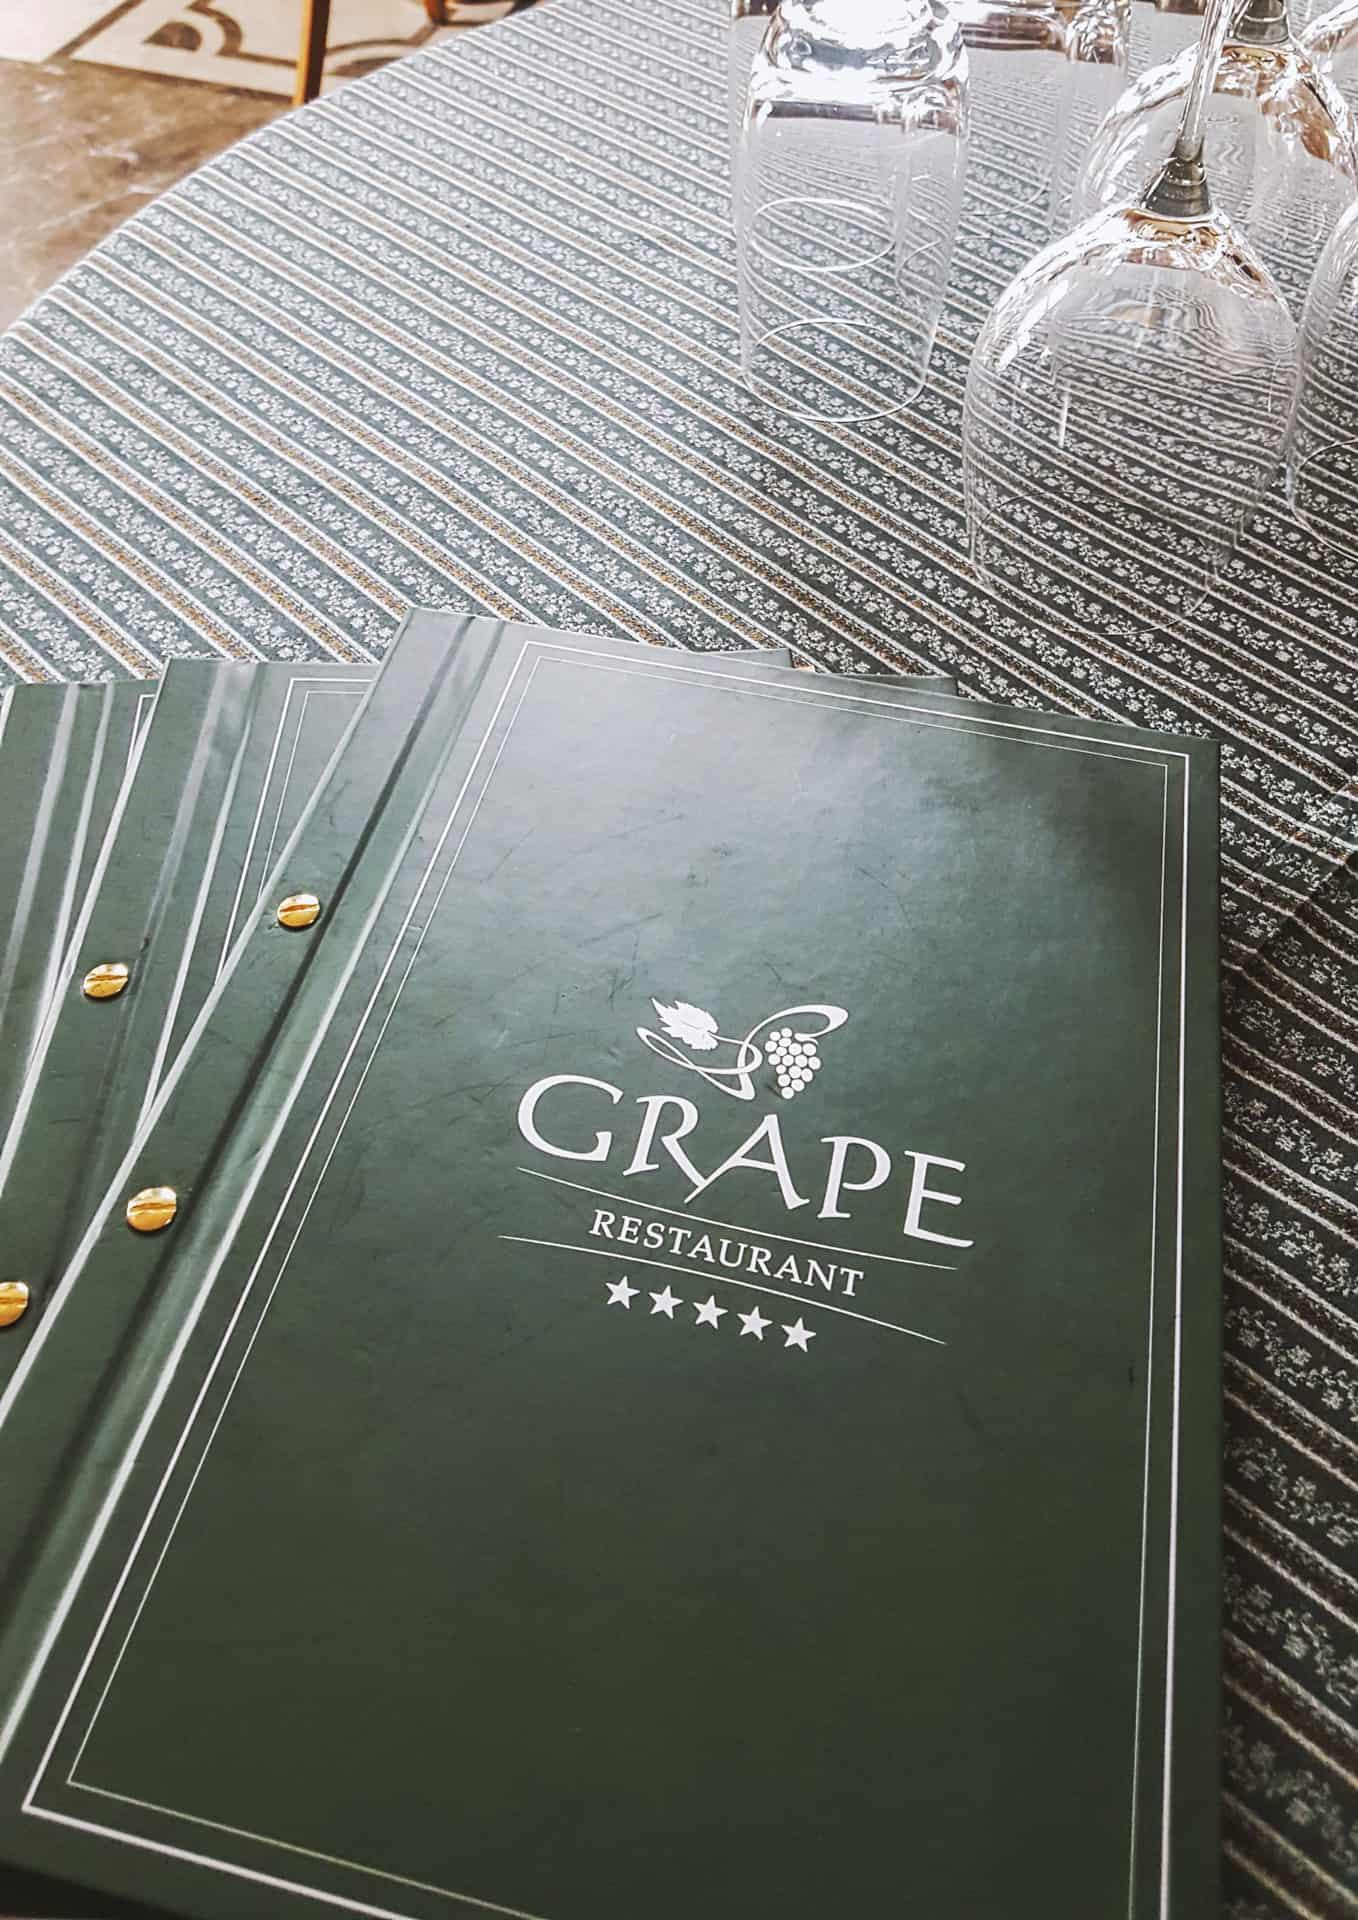 etui na menu z logo Grape